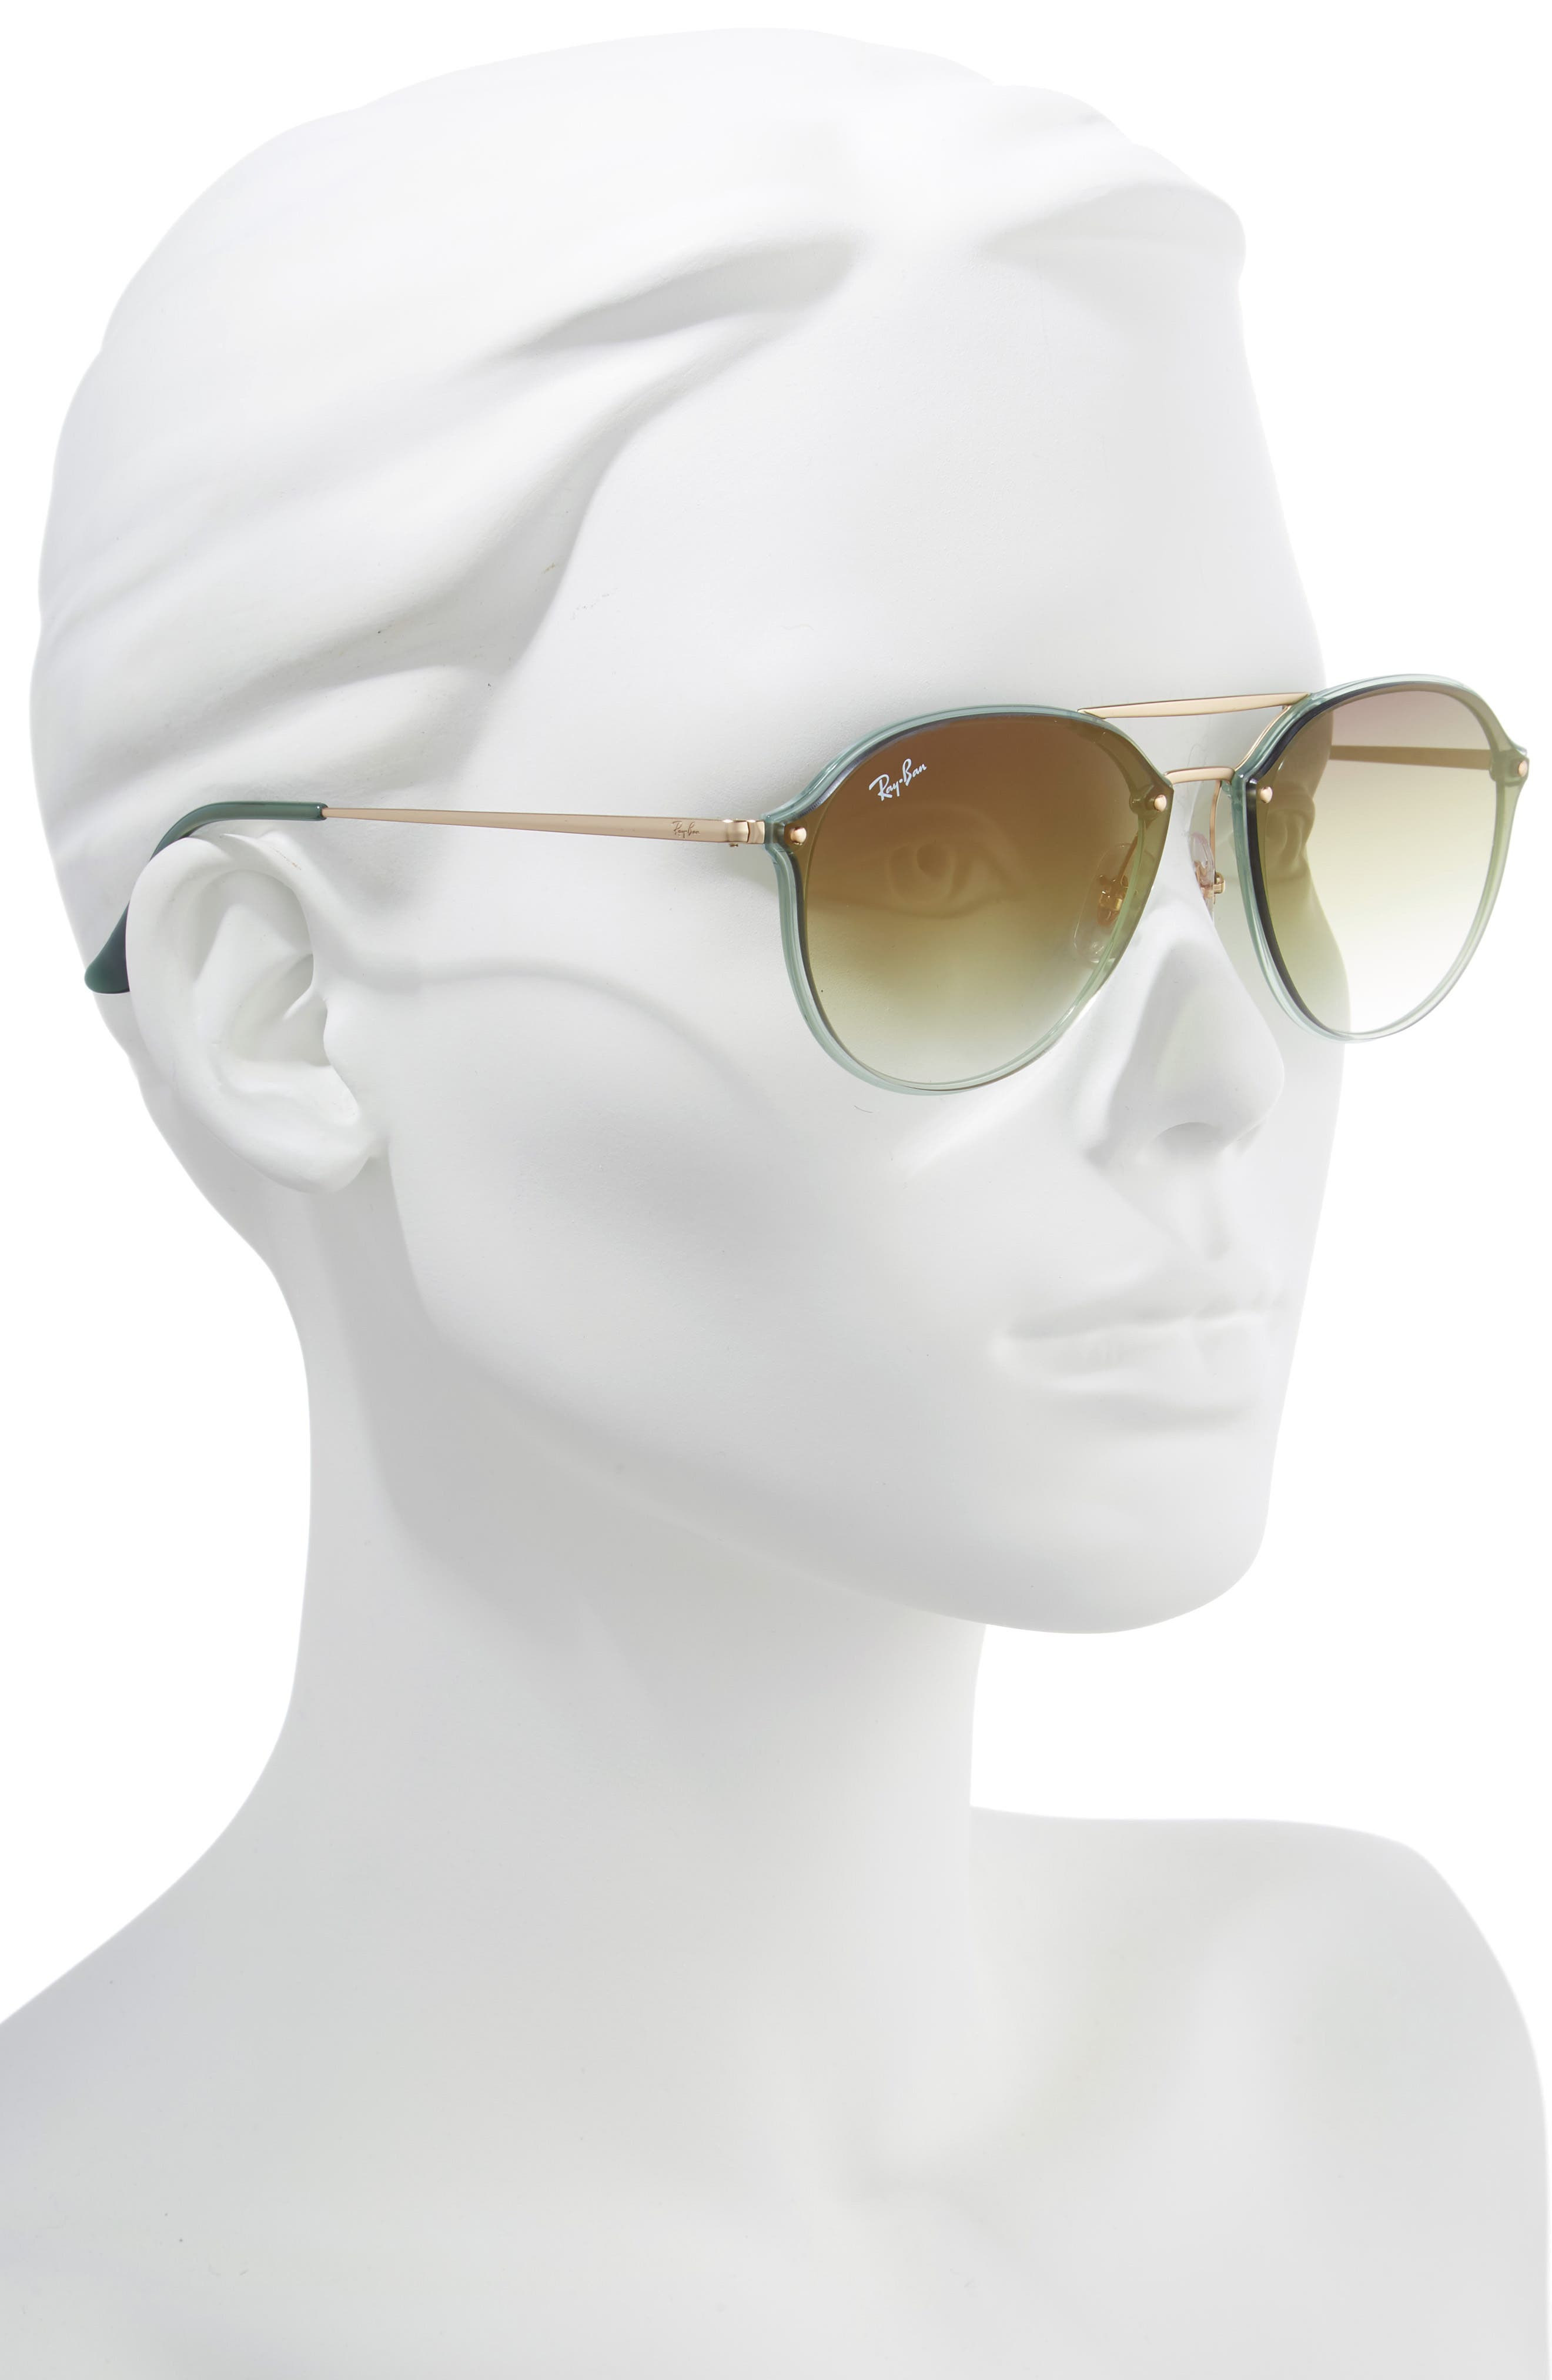 61mm Gradient Aviator Sunglasses,                             Alternate thumbnail 2, color,                             GREEN/ GOLD GRADIENT